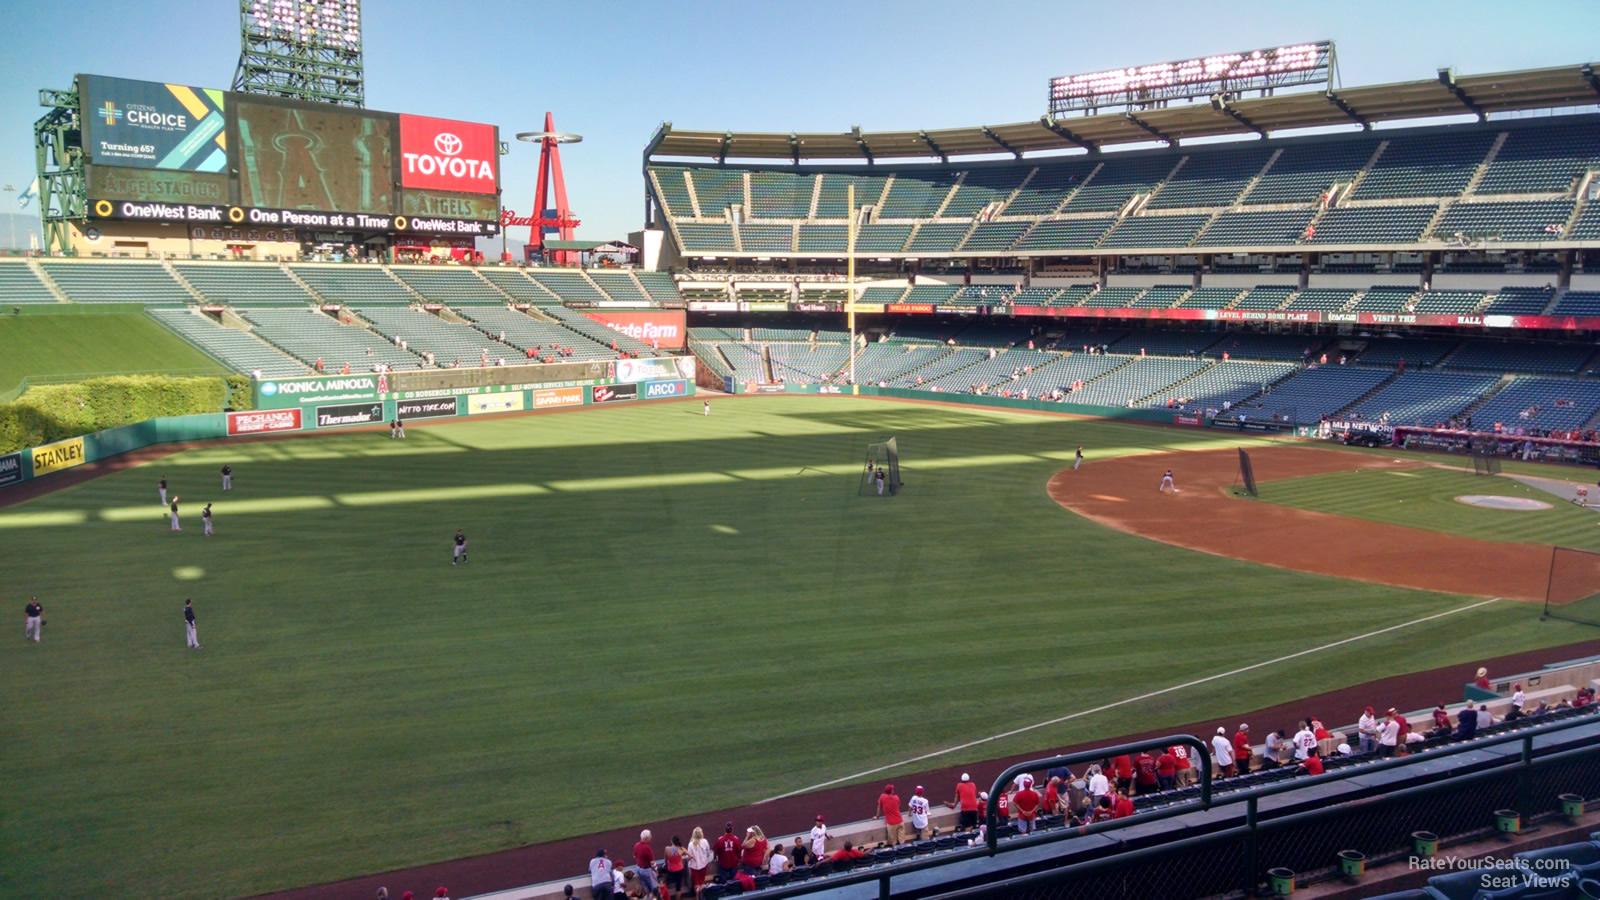 Angel Stadium Section 307 - RateYourSeats.com